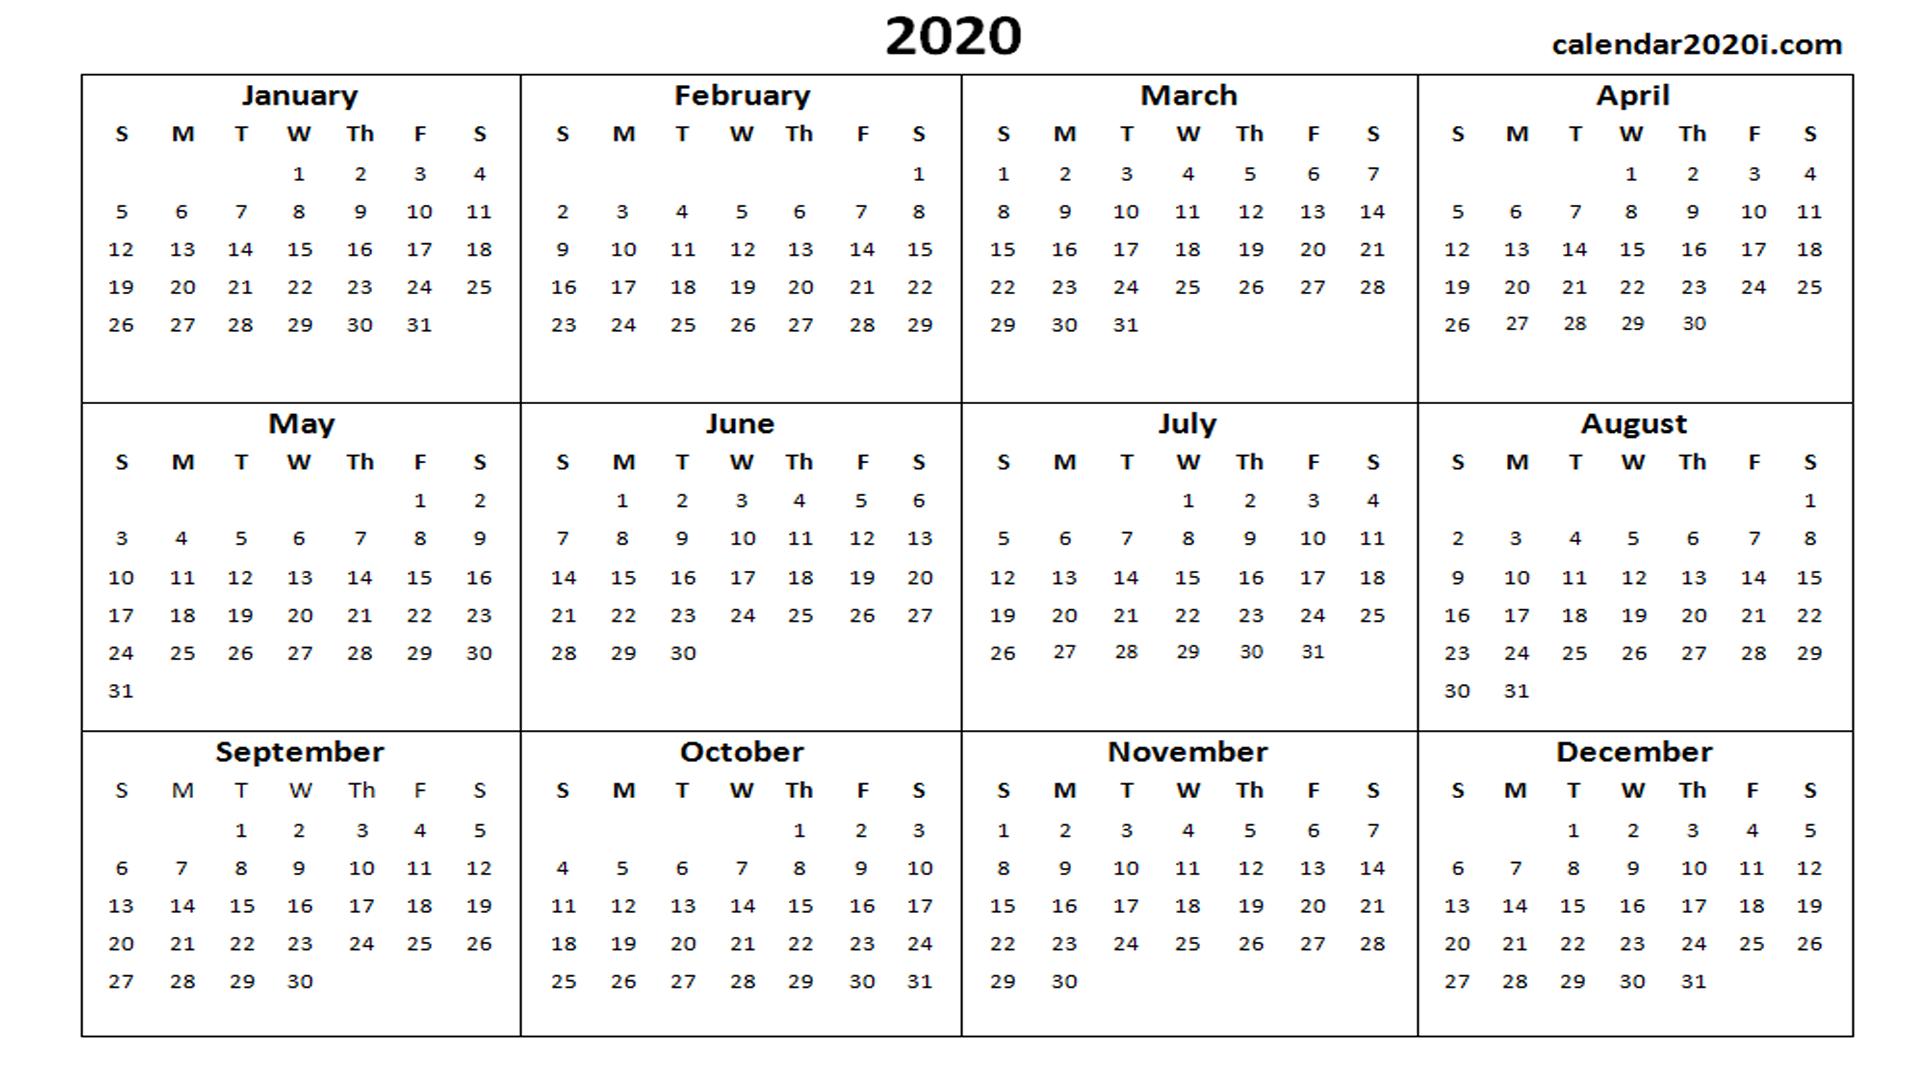 2020 Calendar Wallpapers - Wallpaper Cave